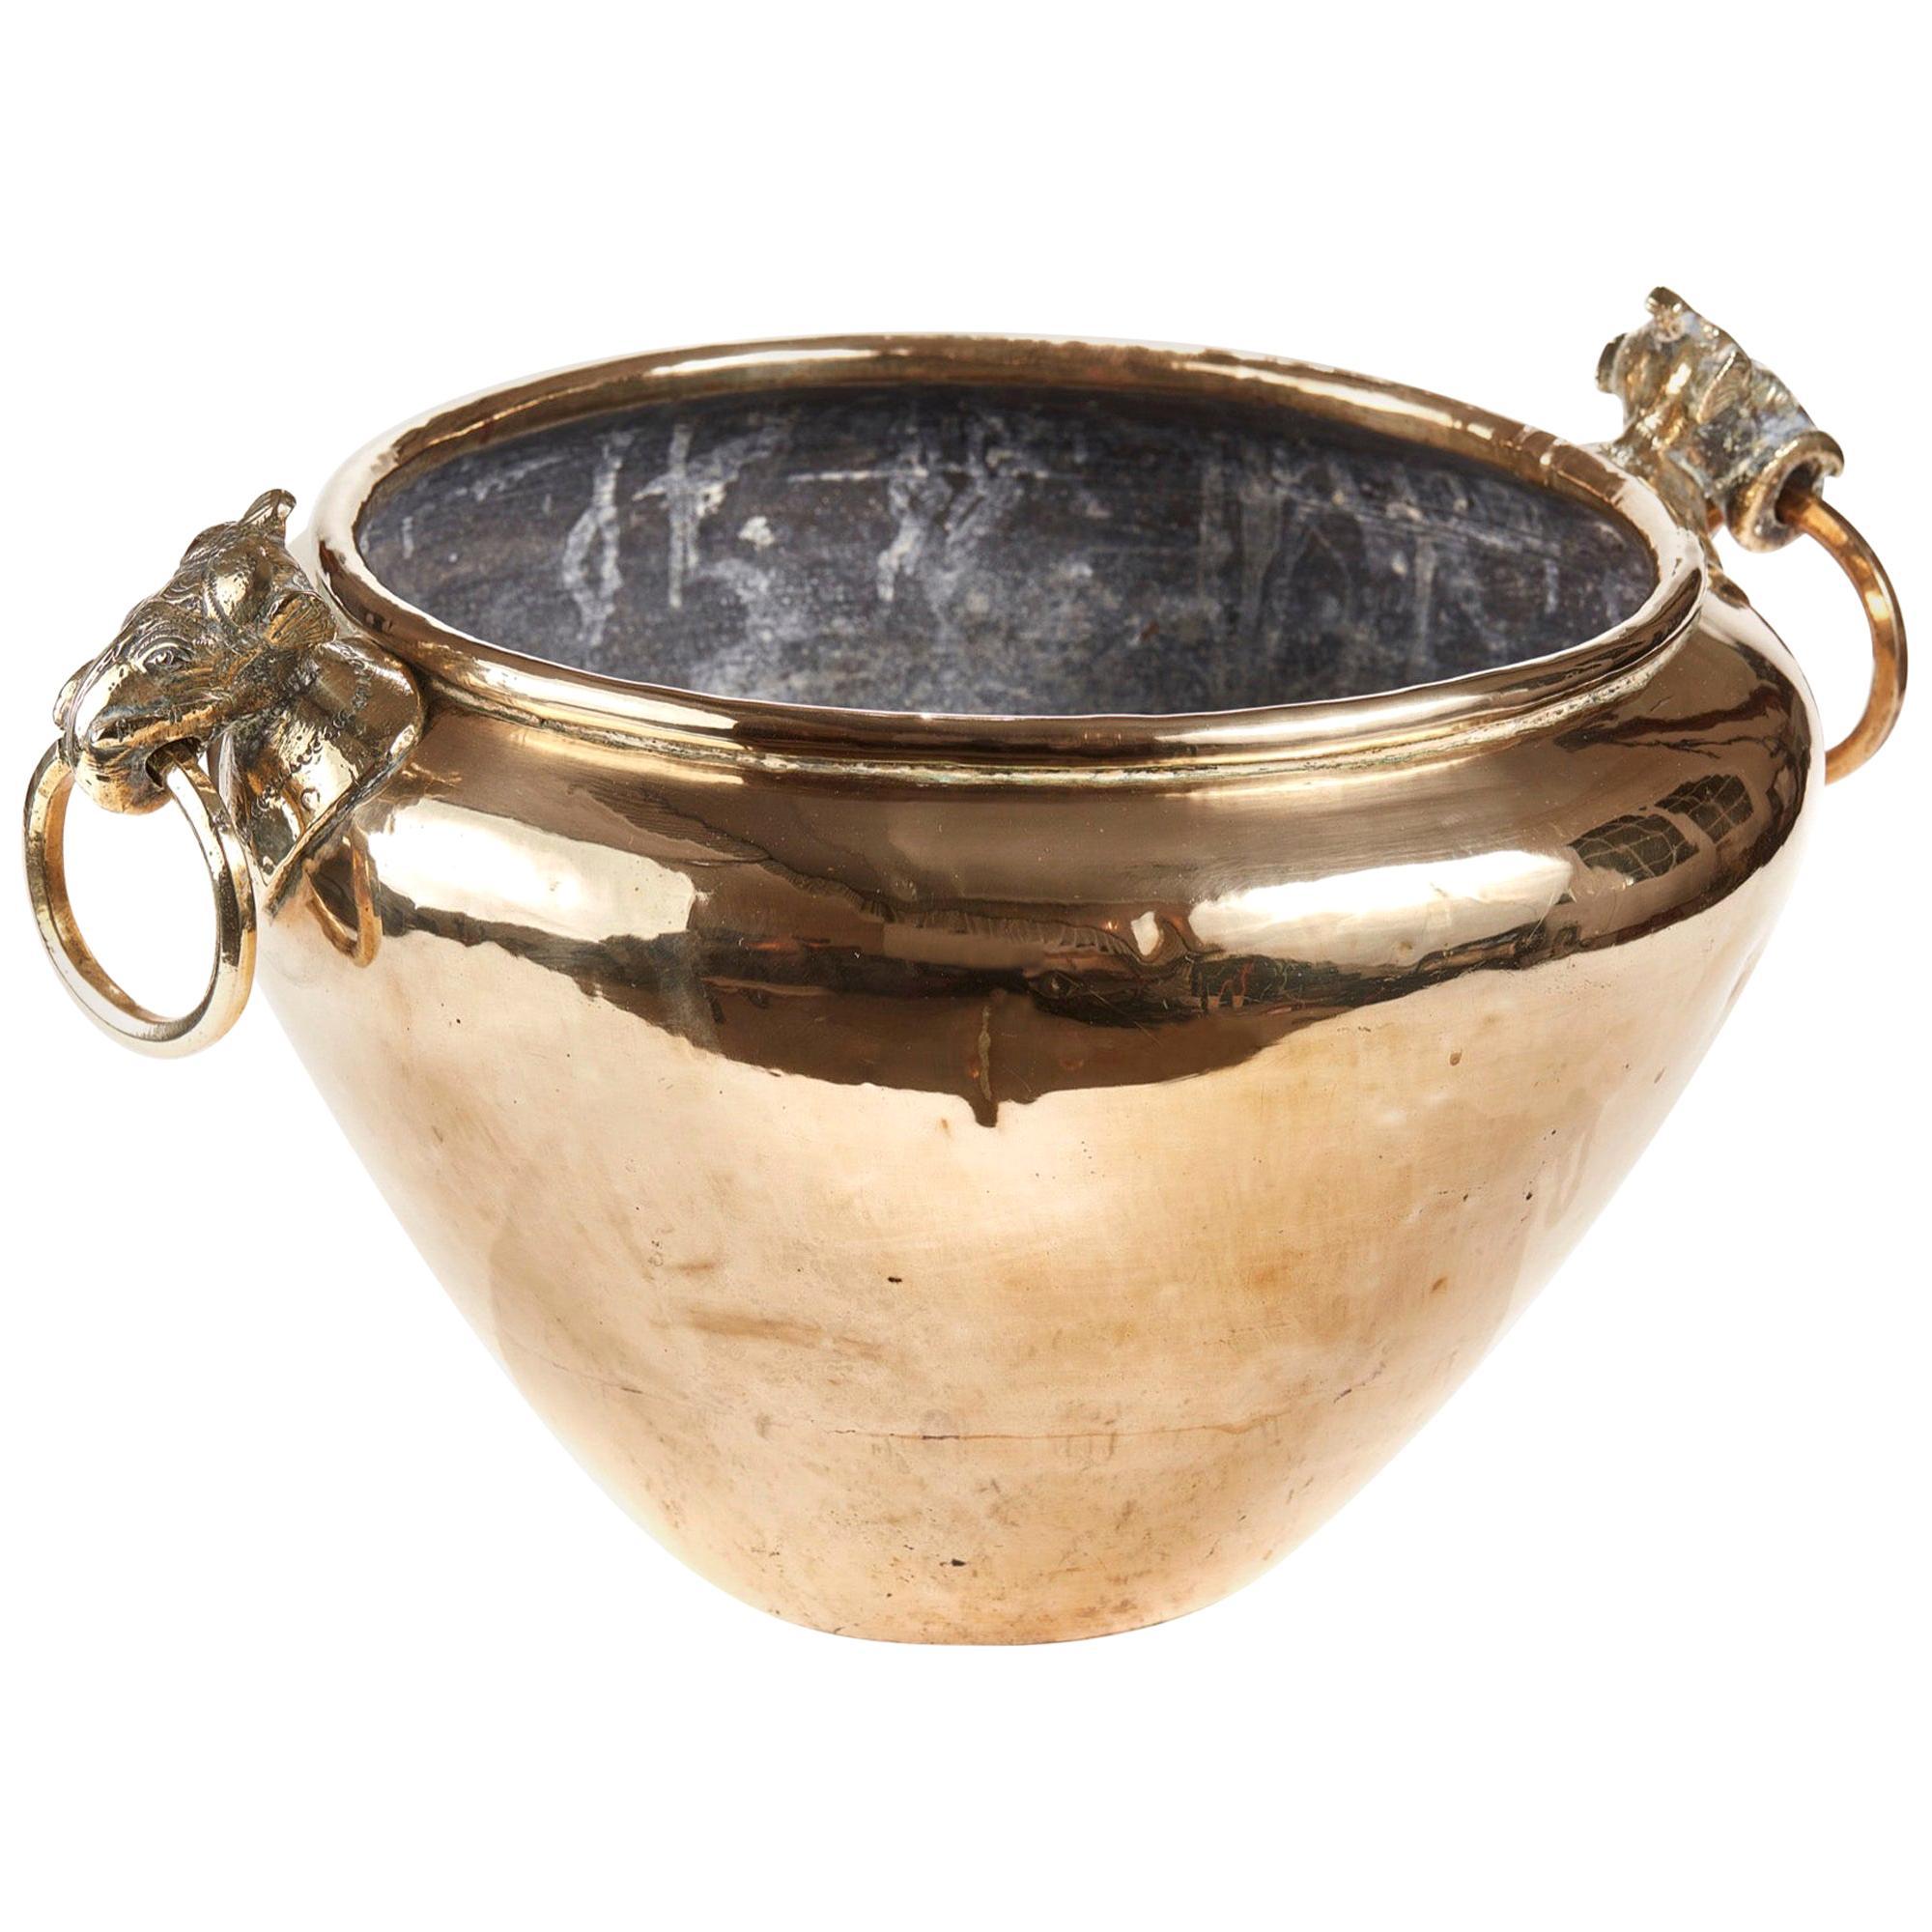 Antique 19th Century Brass Cauldron